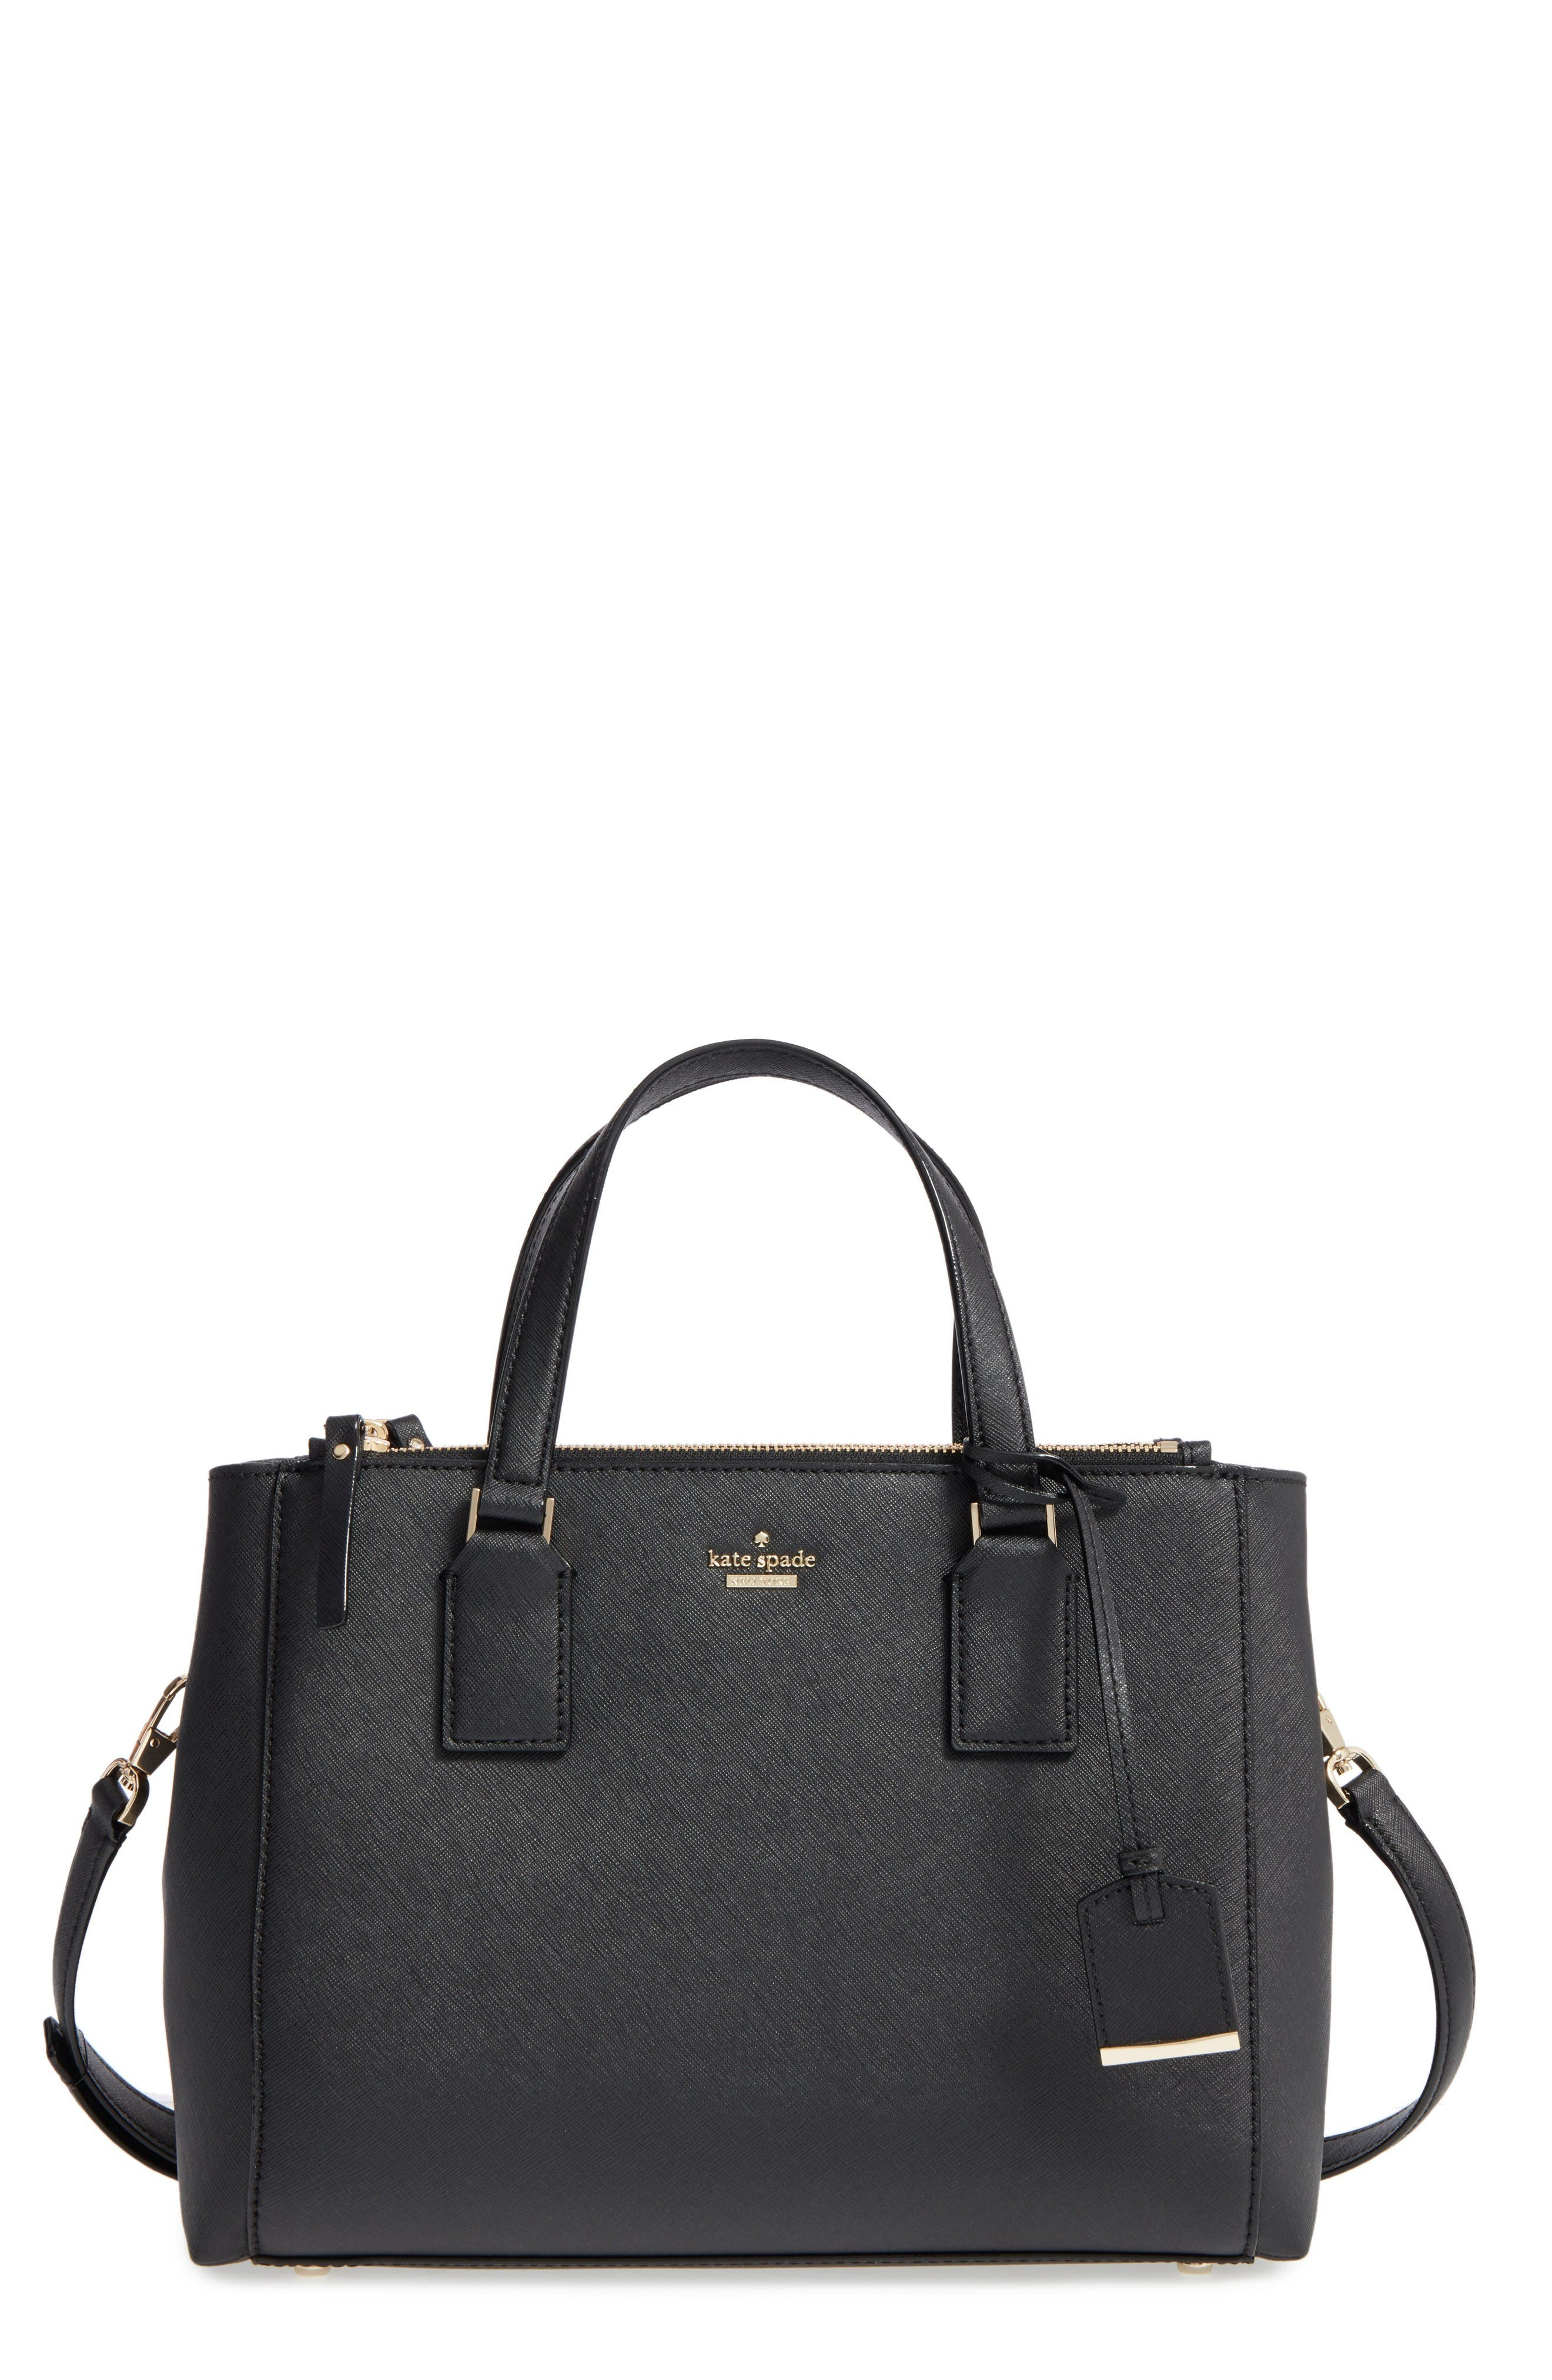 cameron street - teegan calfskin leather satchel,                         Main,                         color, Black